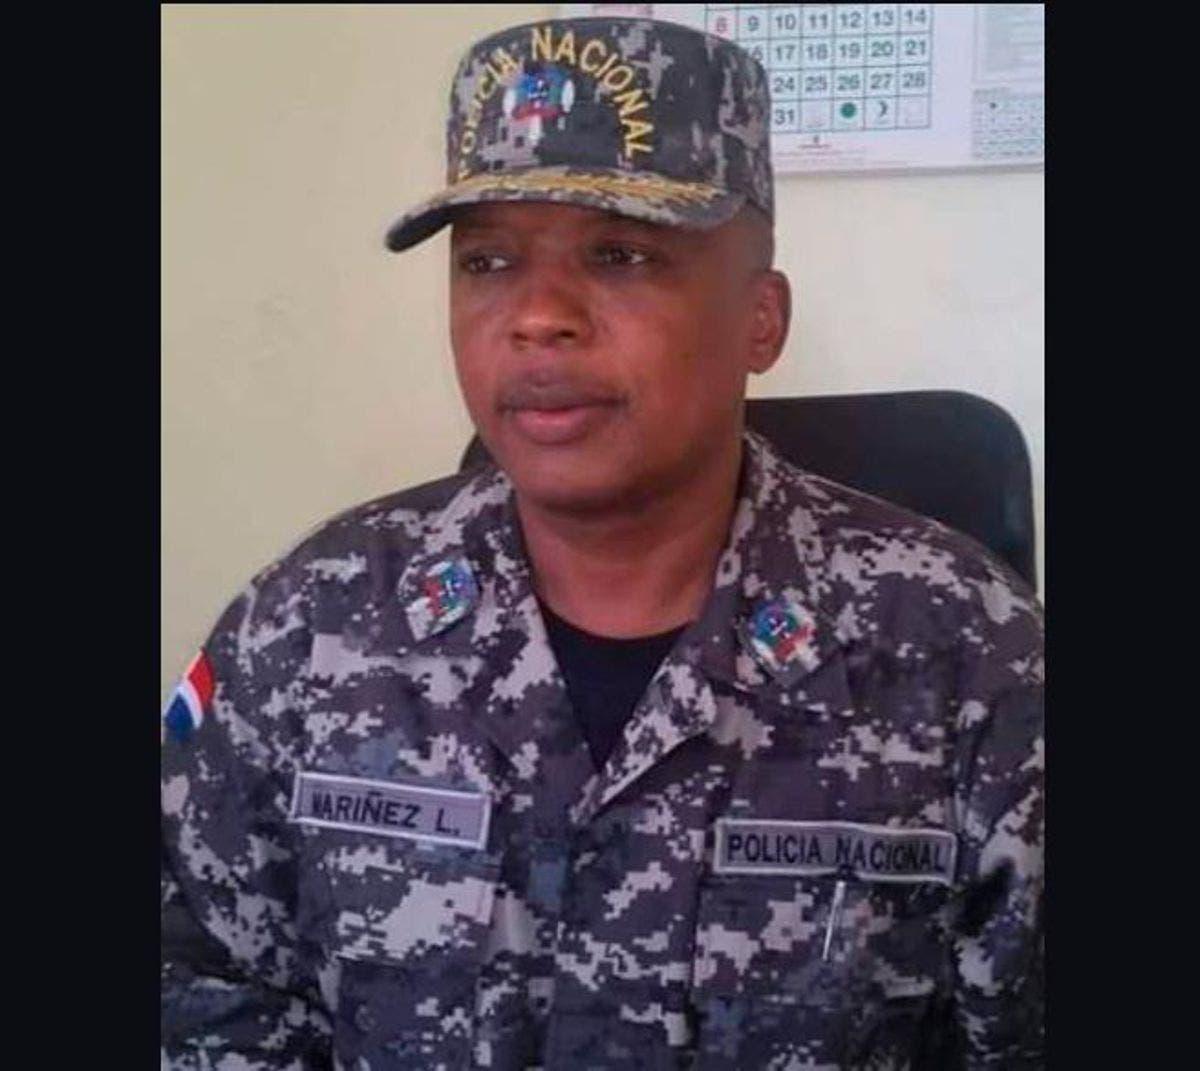 Arrestan coronel Maríñez Lora por caso de pareja cristiana acribillada por policías en Villa Altagracia